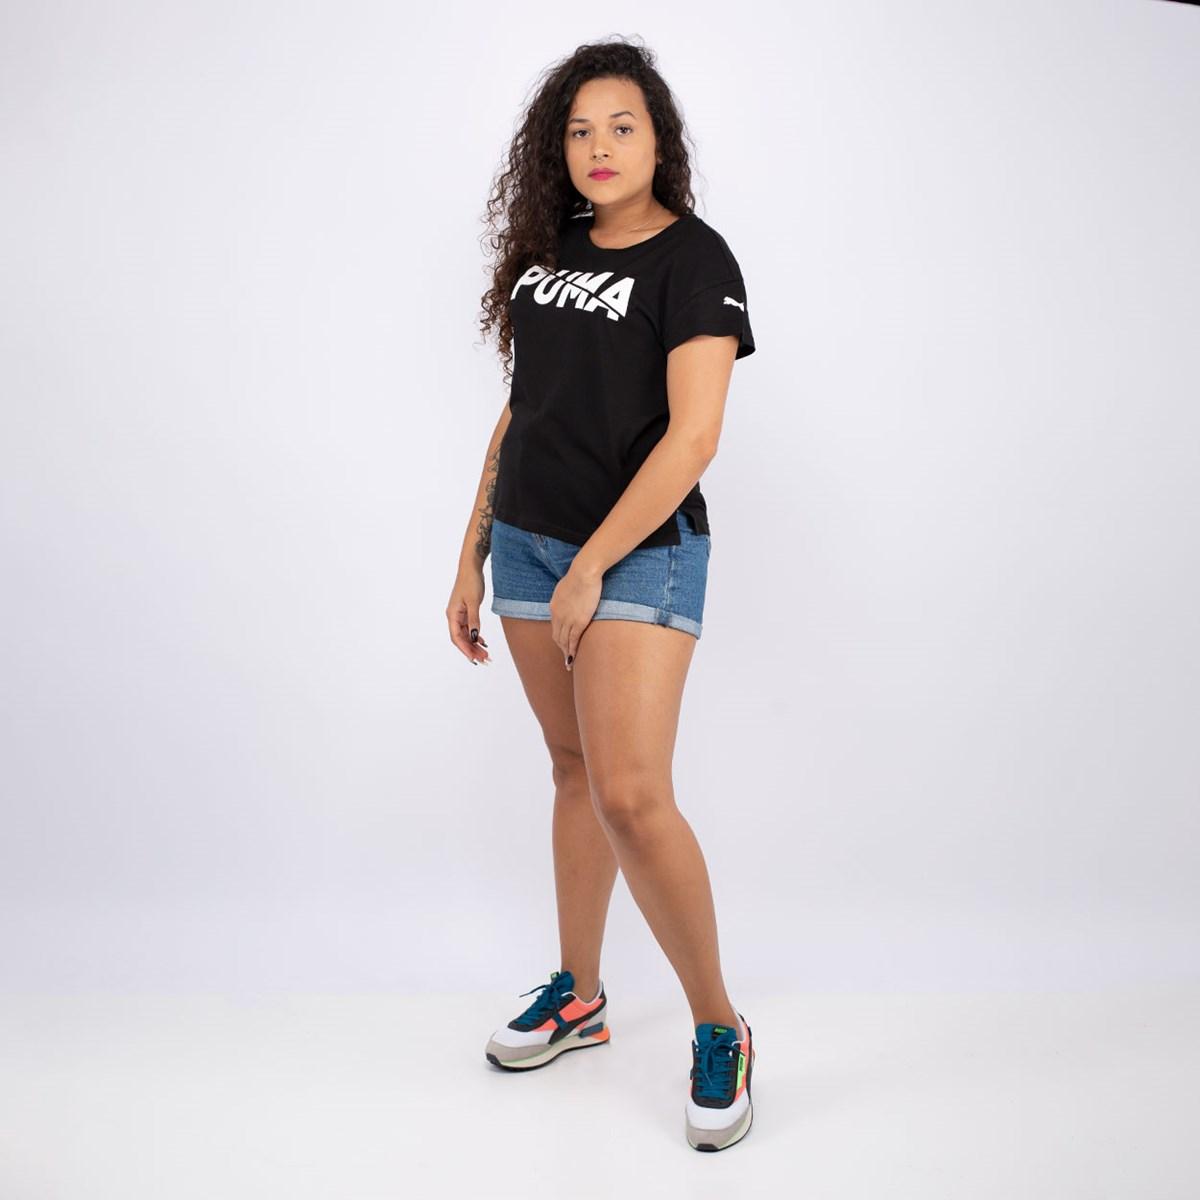 Camiseta Puma Modern Sports Graphic Black 583536-01